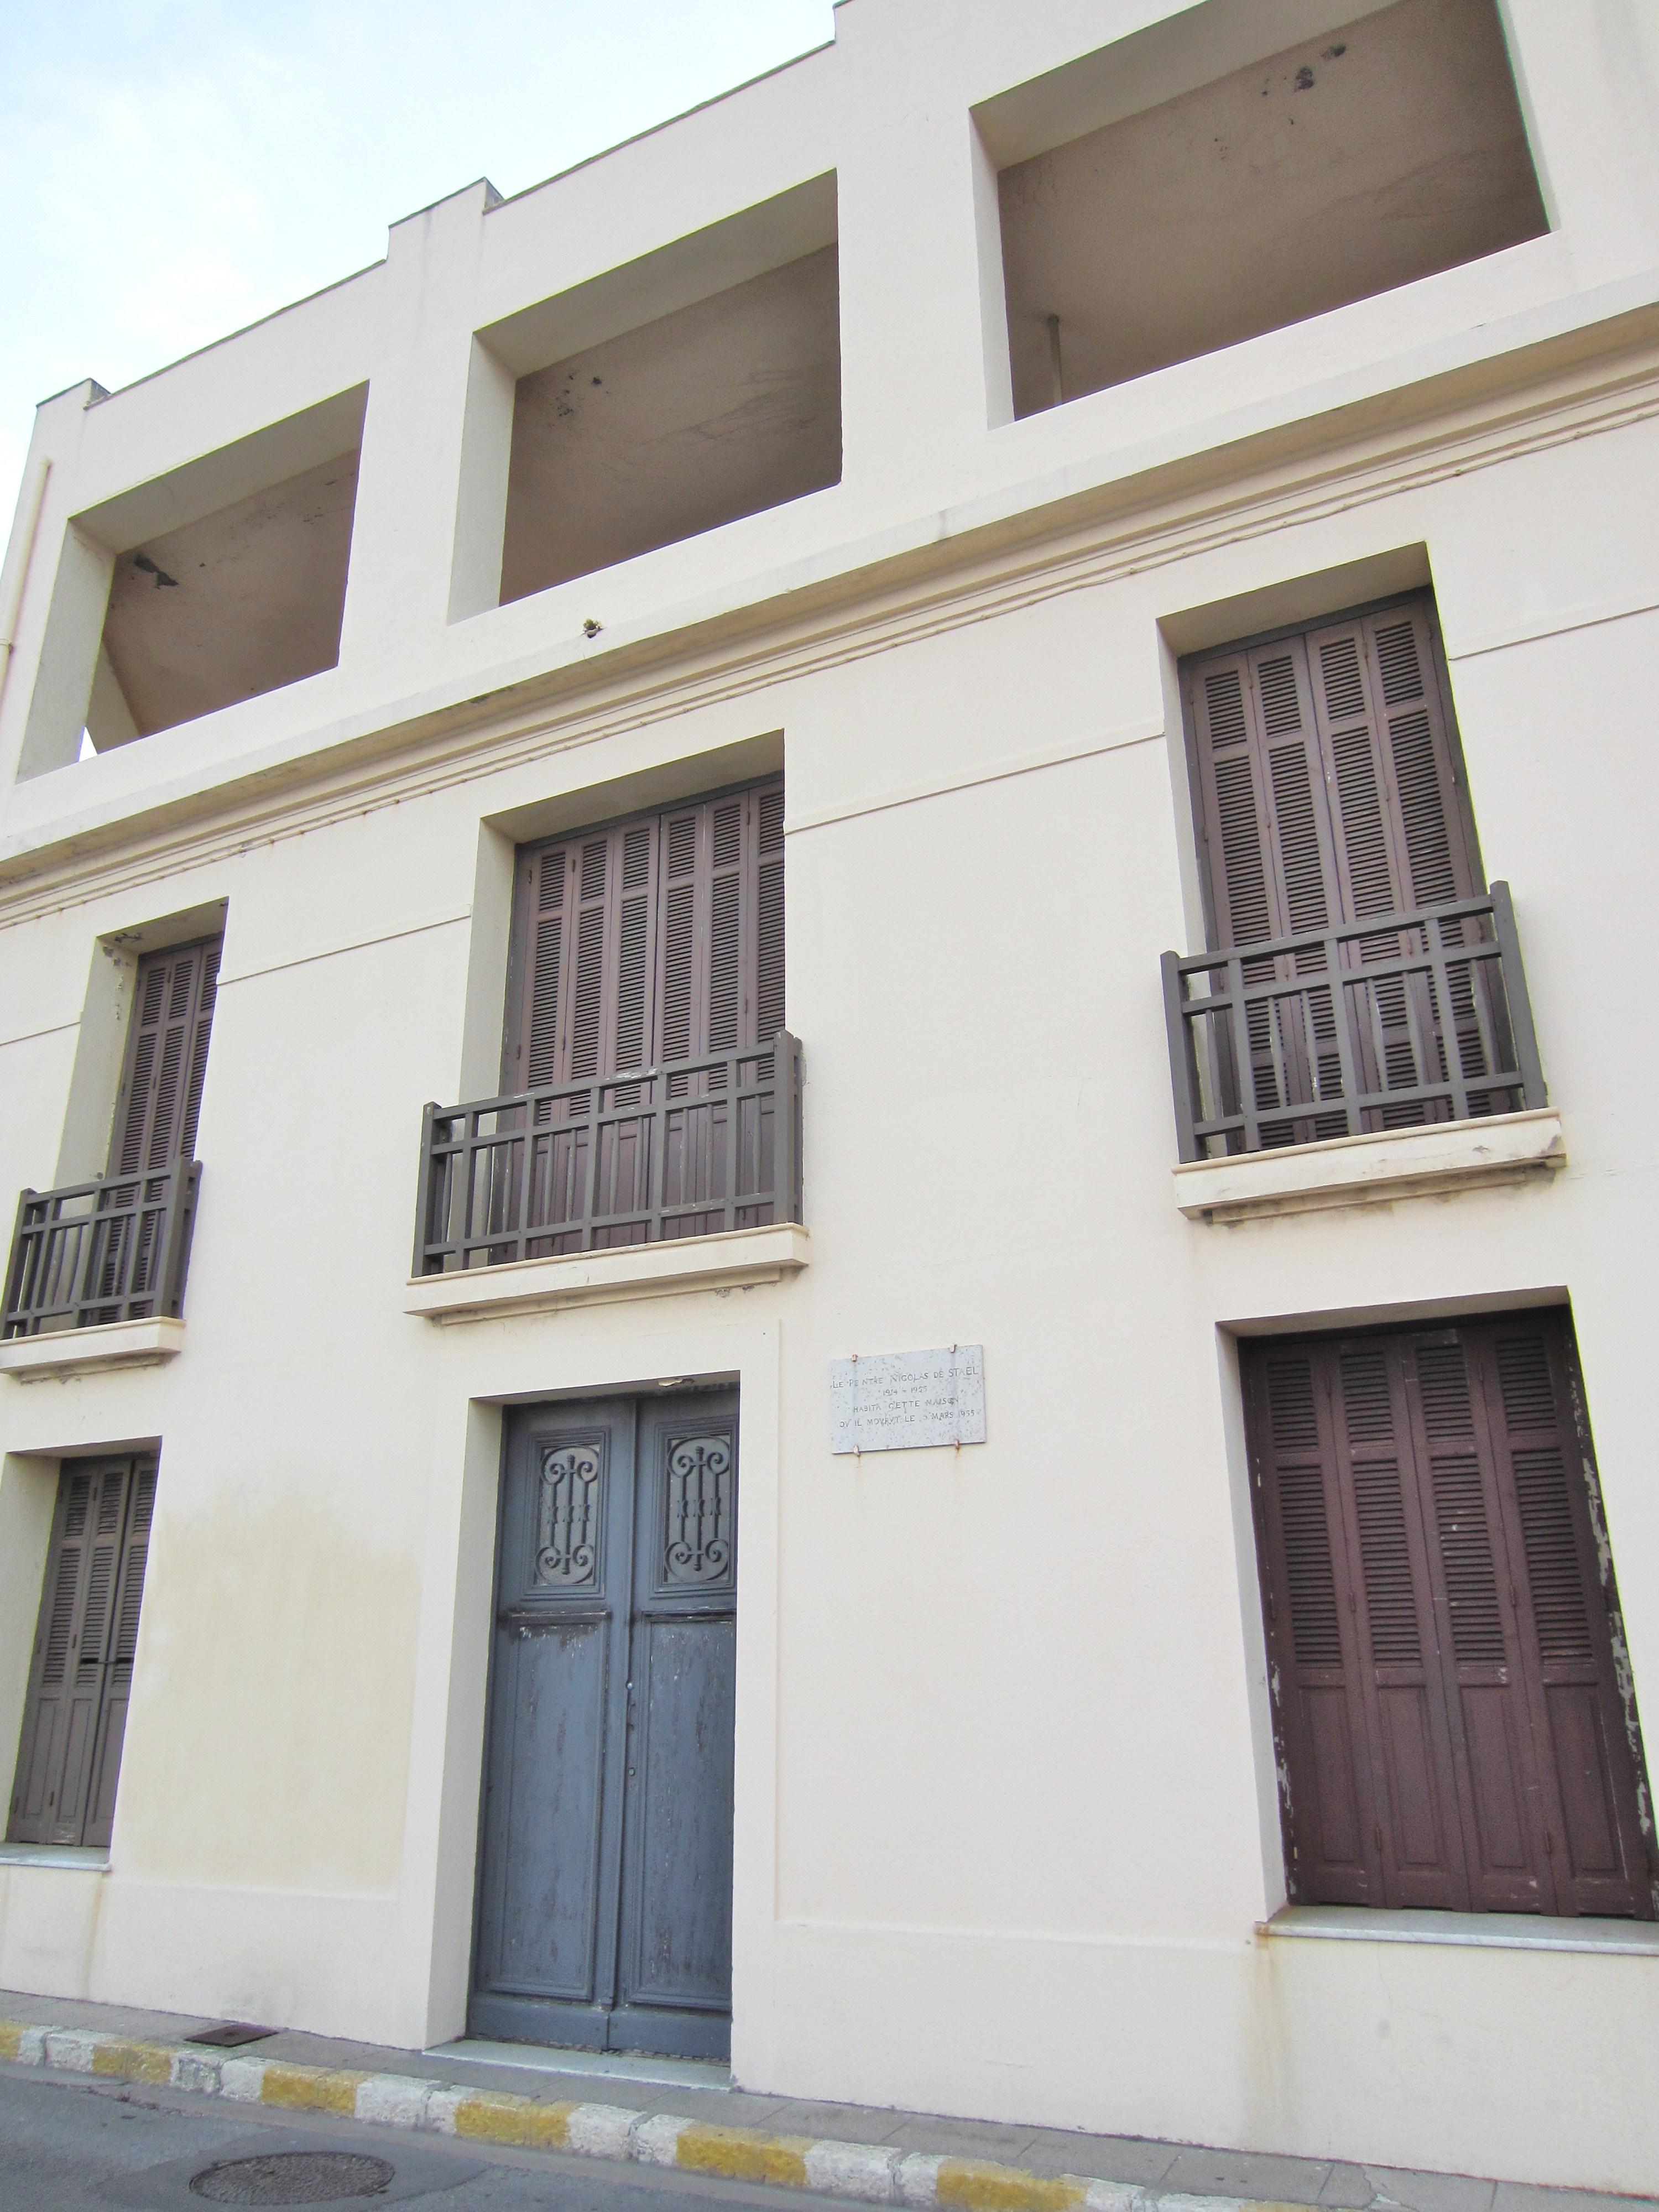 indogatecom maison moderne antibes - Maison Moderne Antibes